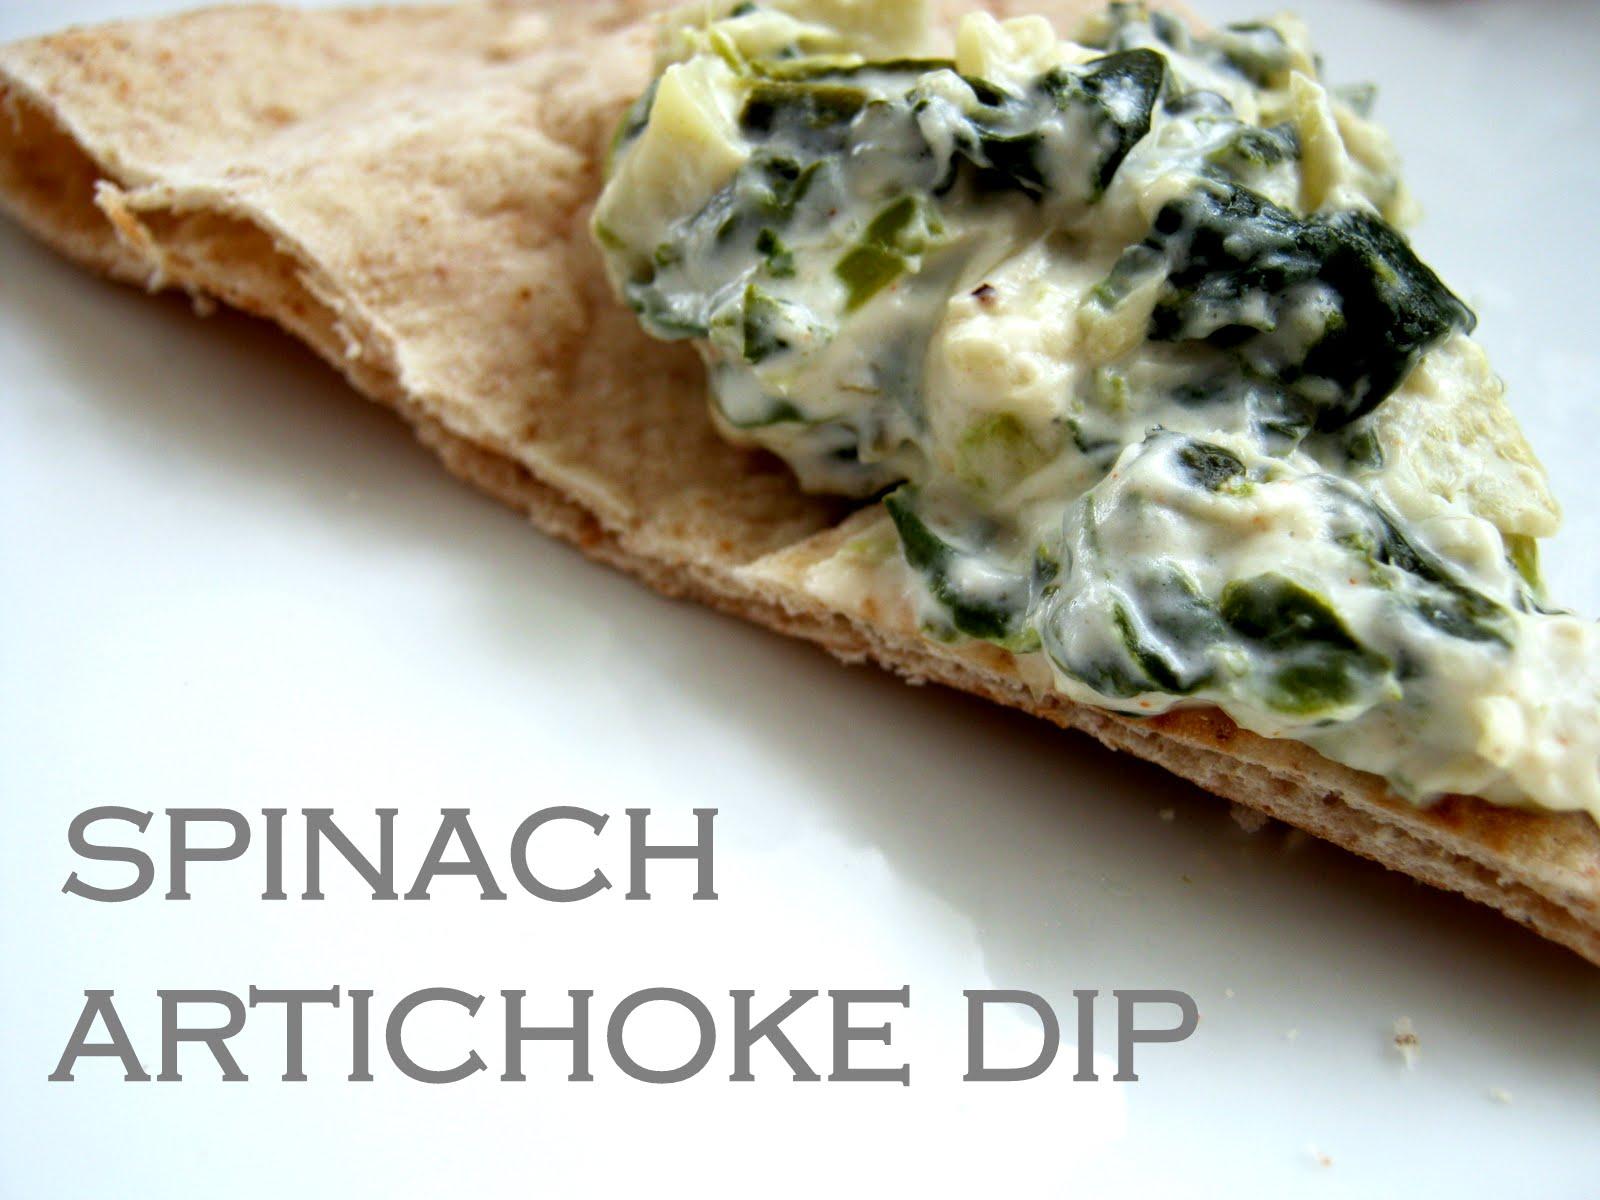 hot spinach artichoke dip spinach artichoke dip spinach artichoke ...